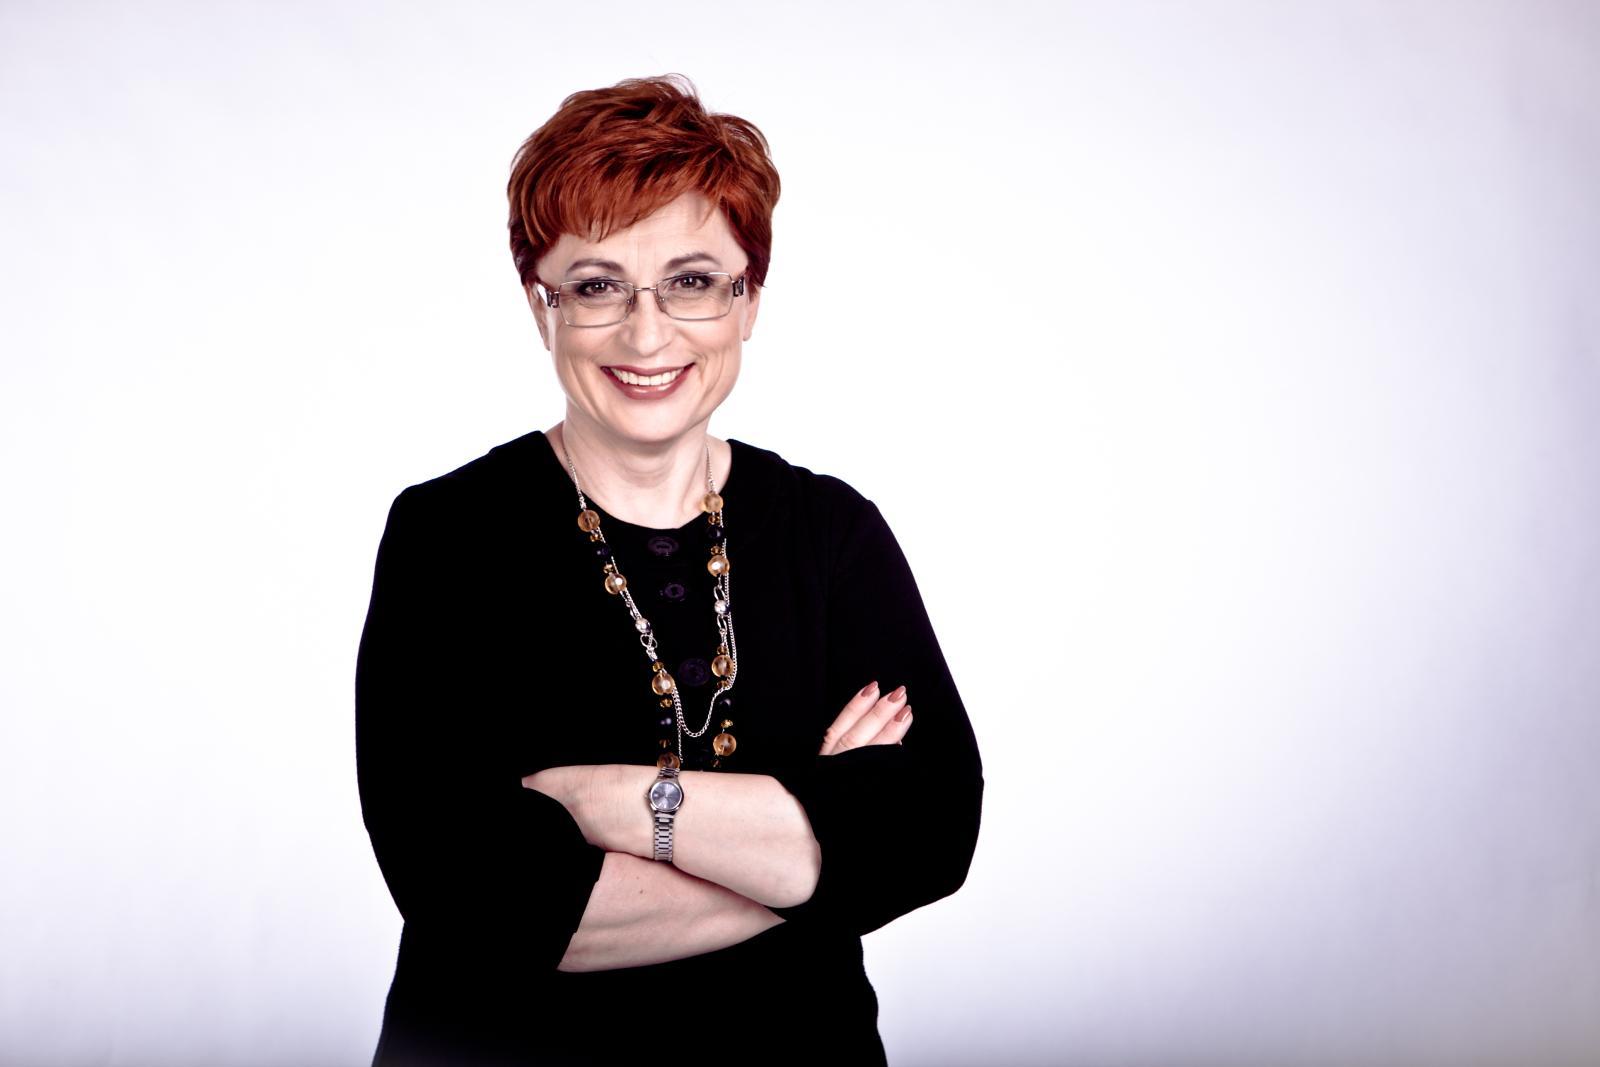 Усилитель мощности руководителя, Пришвицина Елена